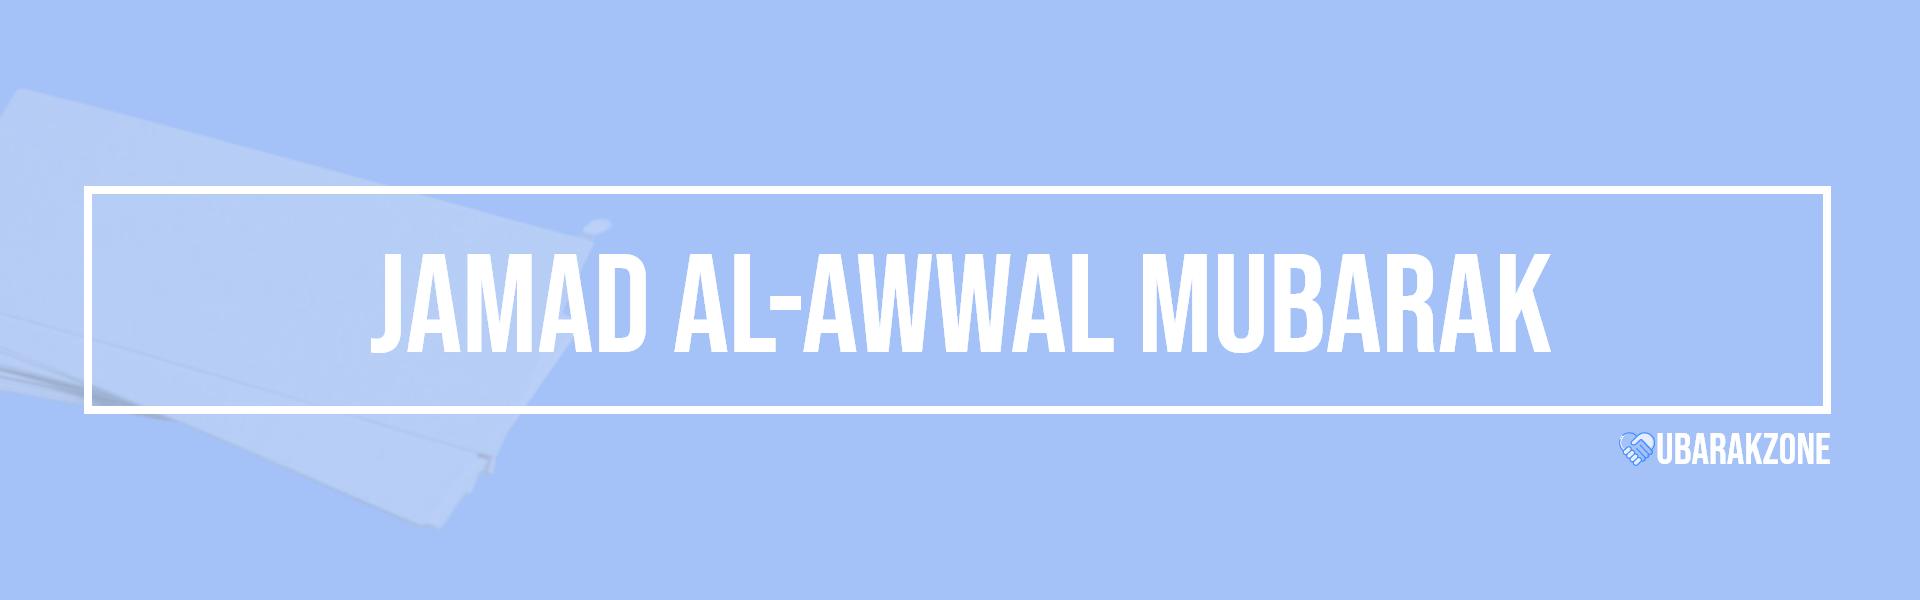 jamad al-awwal mubarak wishes messages